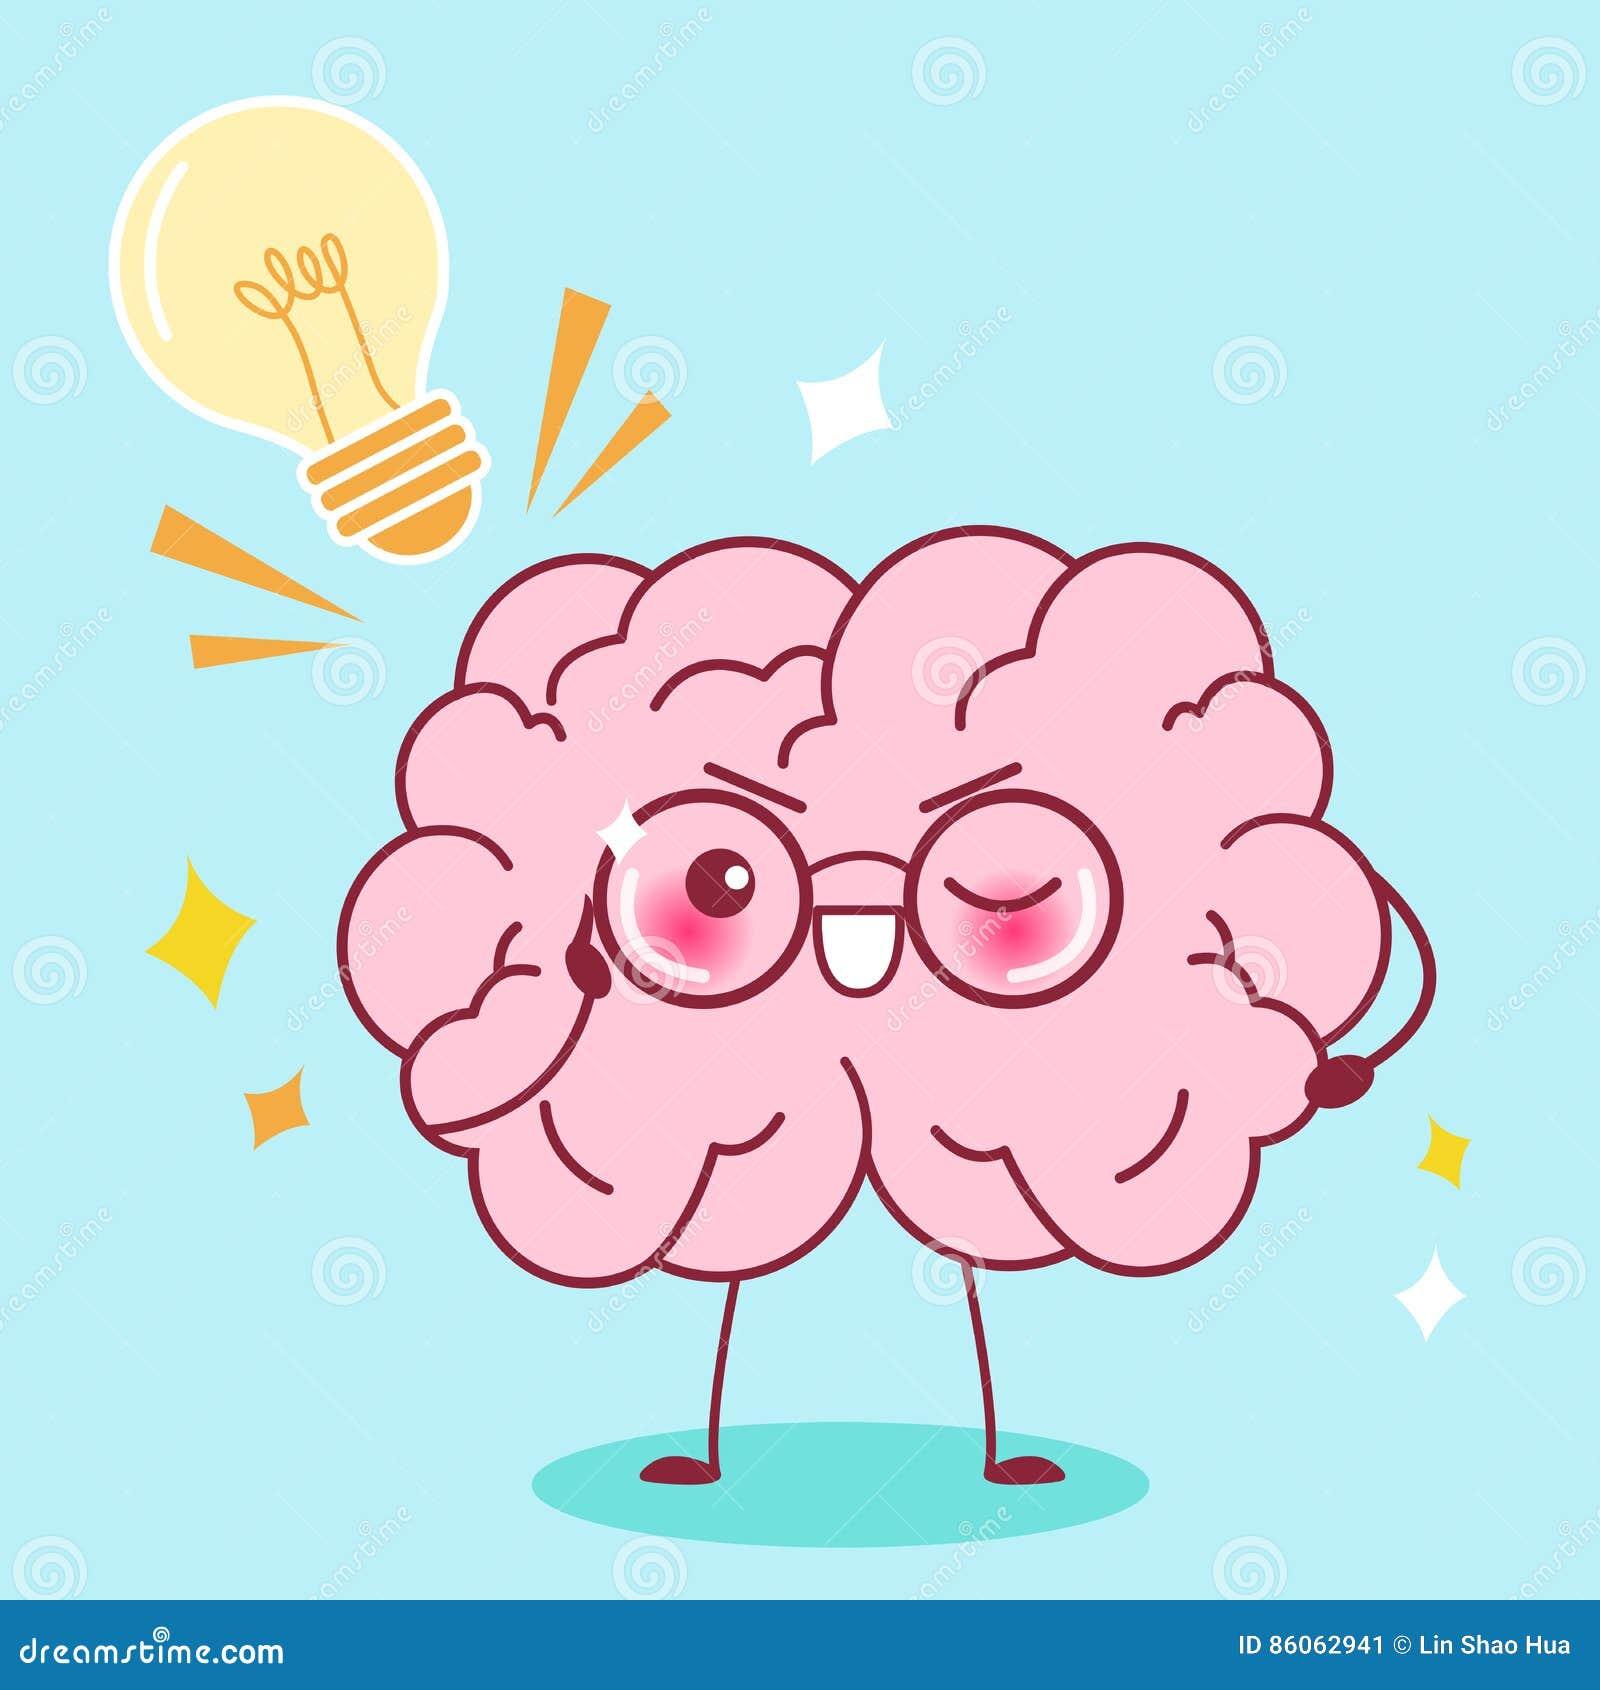 Cute cartoon smart brain stock vector. Illustration of ... for Smart Cartoon Brain  45jwn